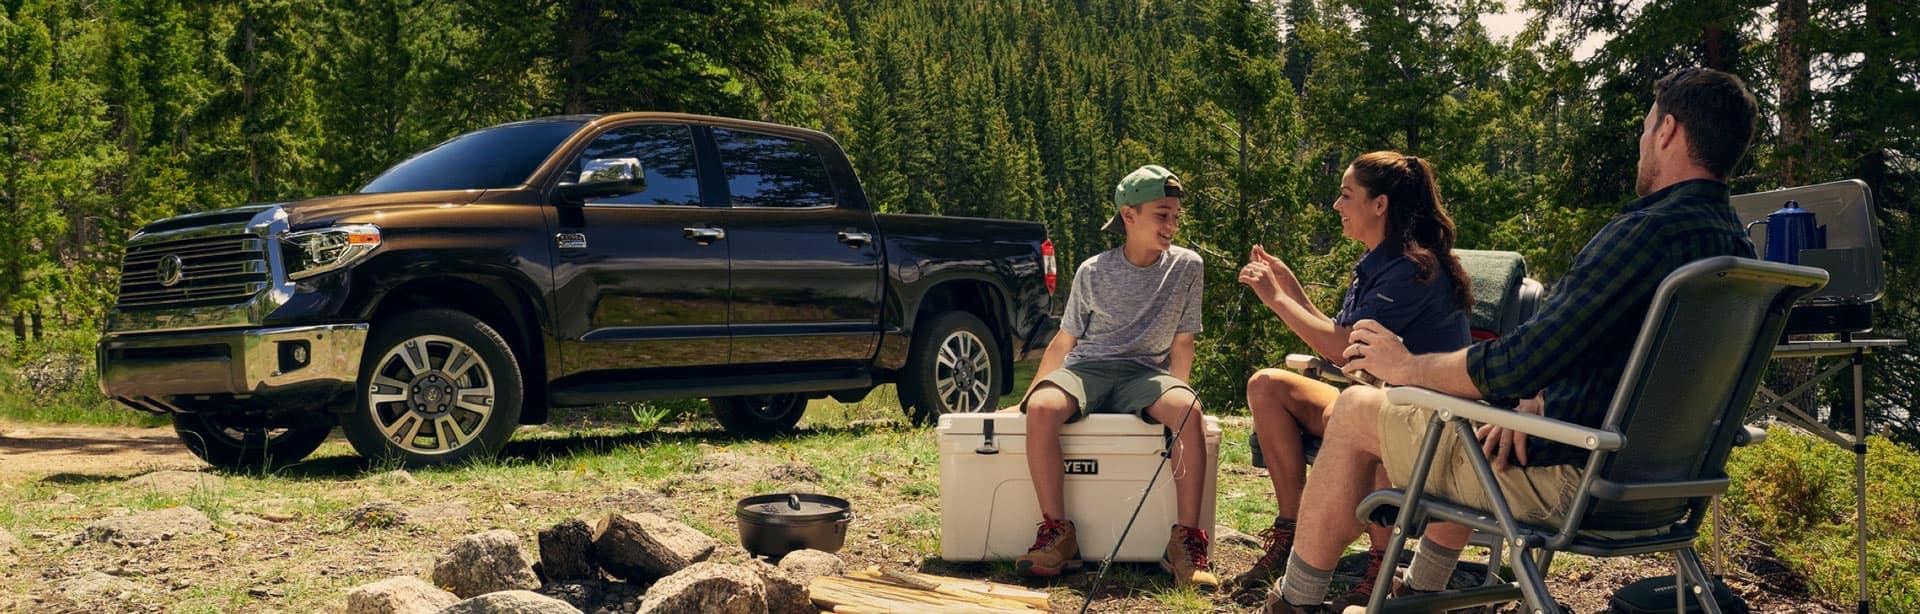 Shepard Toyota Welcome slider - men sitting around a camp fire next to a Toyota truck